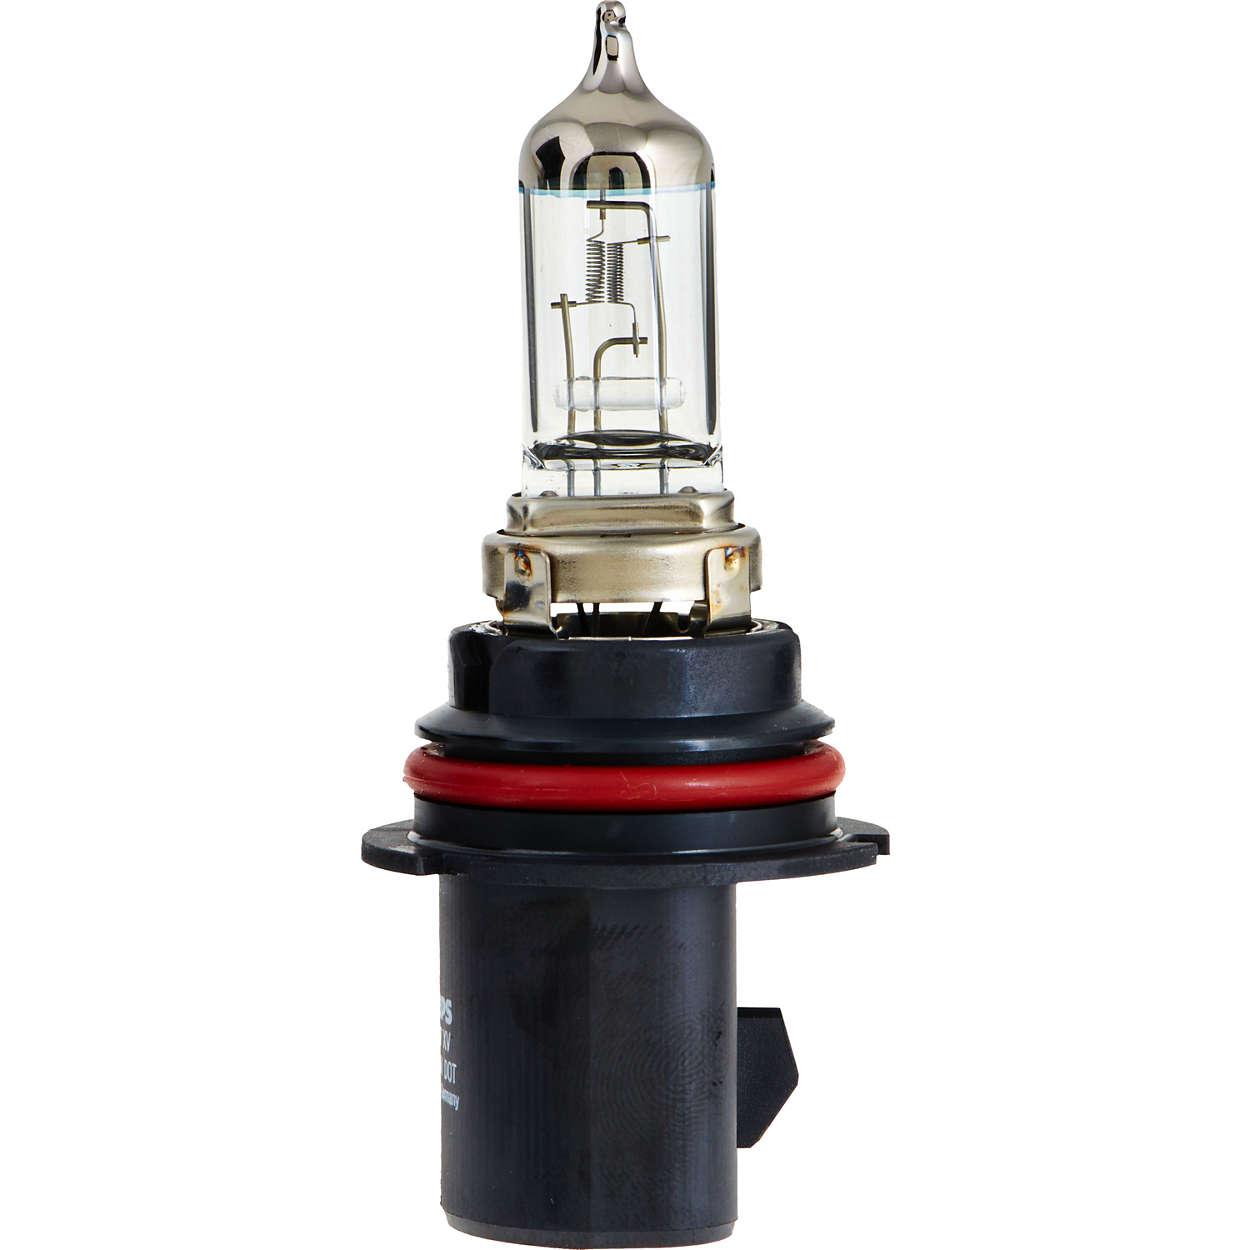 X TremeVision Upgrade Headlight Bulb 9007XVB2